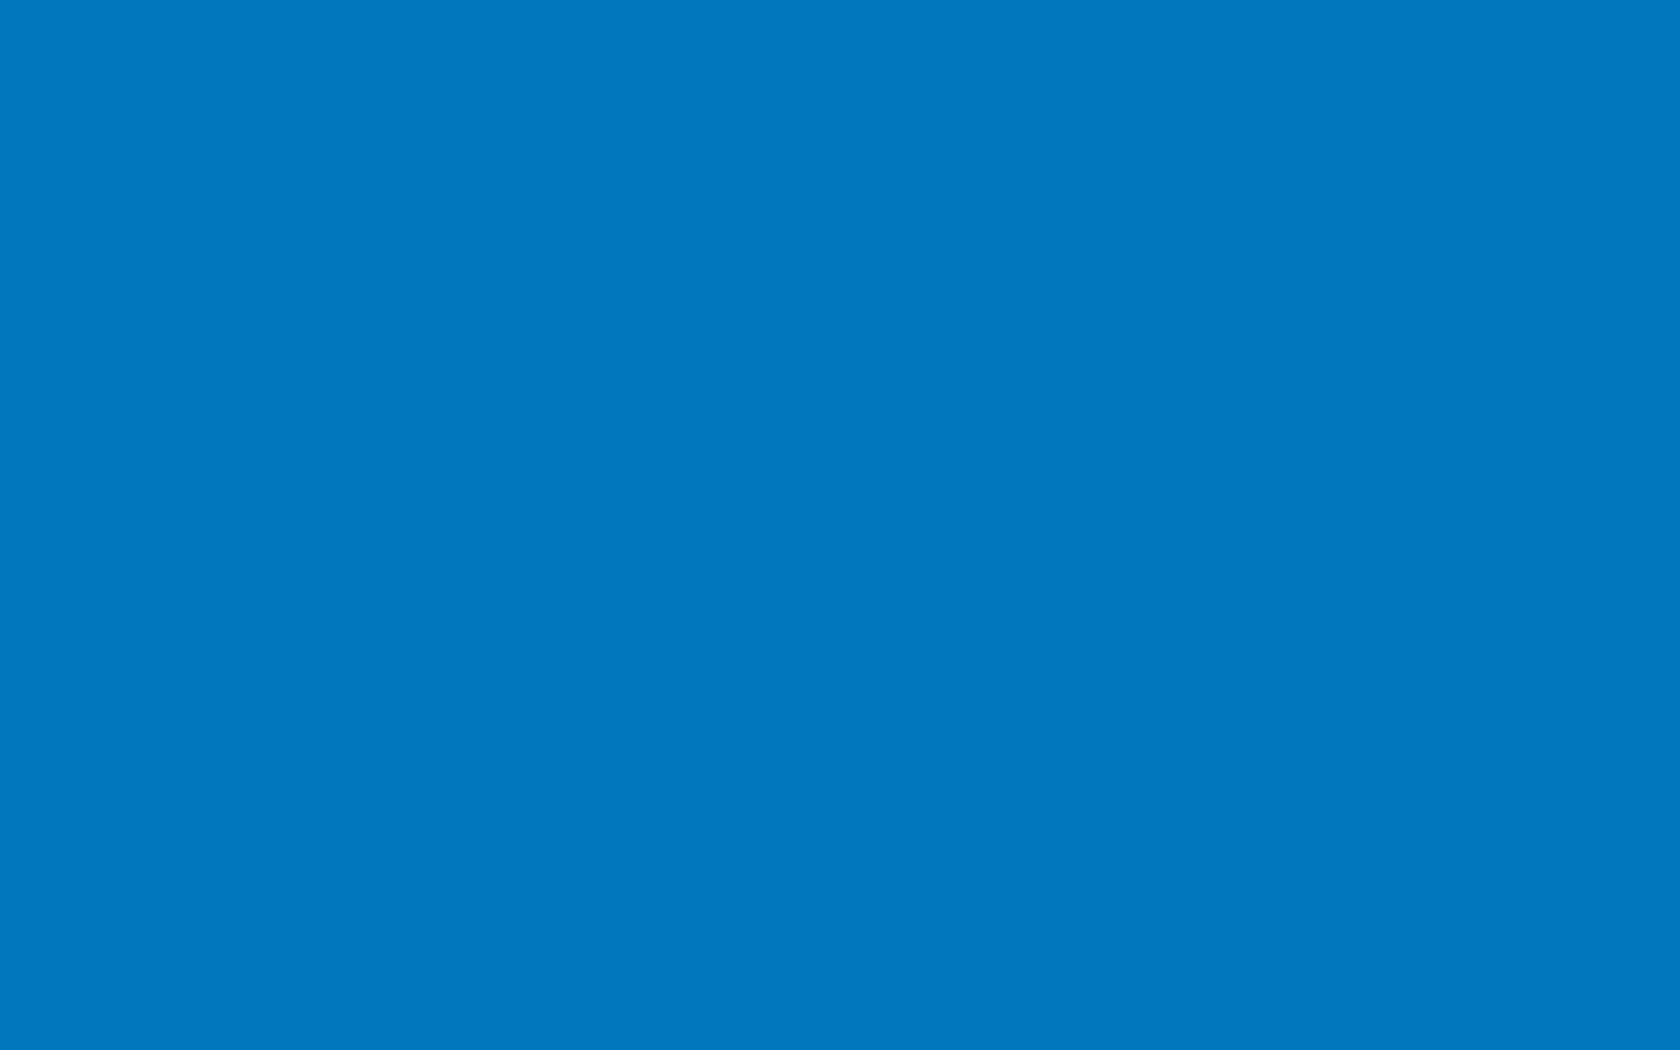 1680x1050 Ocean Boat Blue Solid Color Background